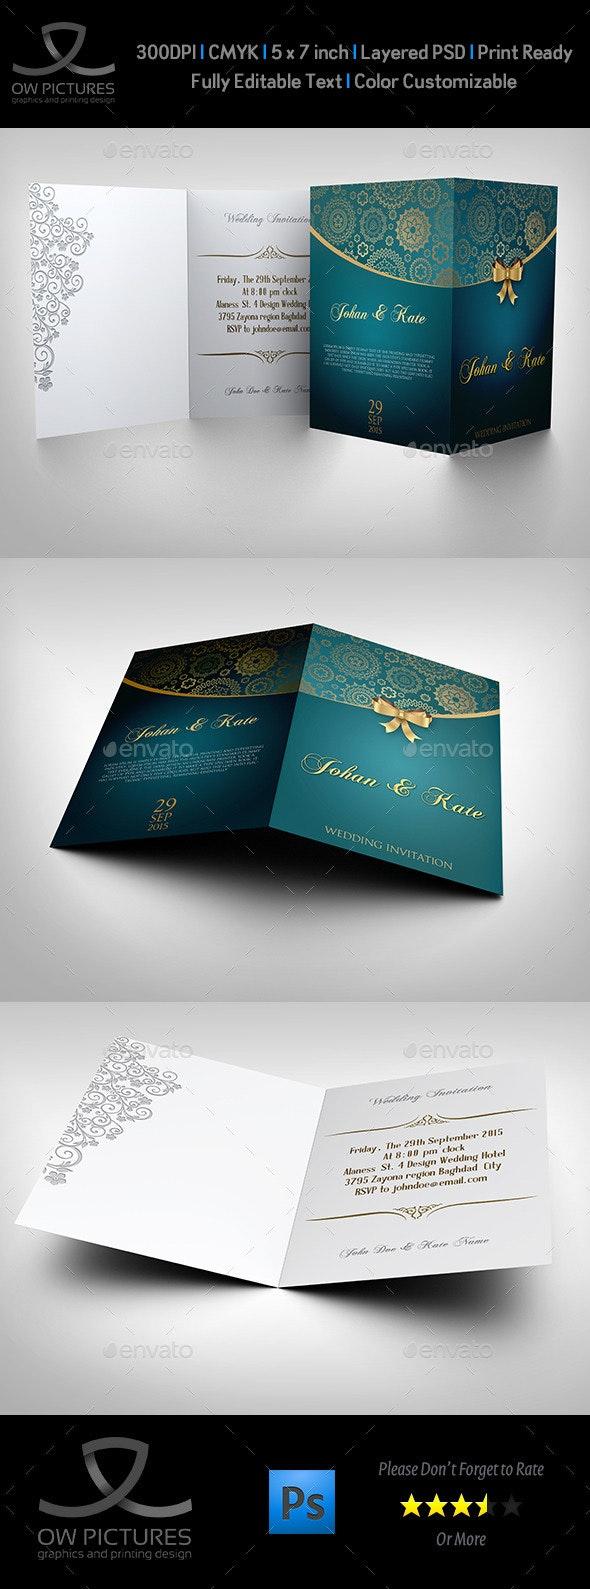 Wedding Invitation Card Template Vol.8 - Weddings Cards & Invites